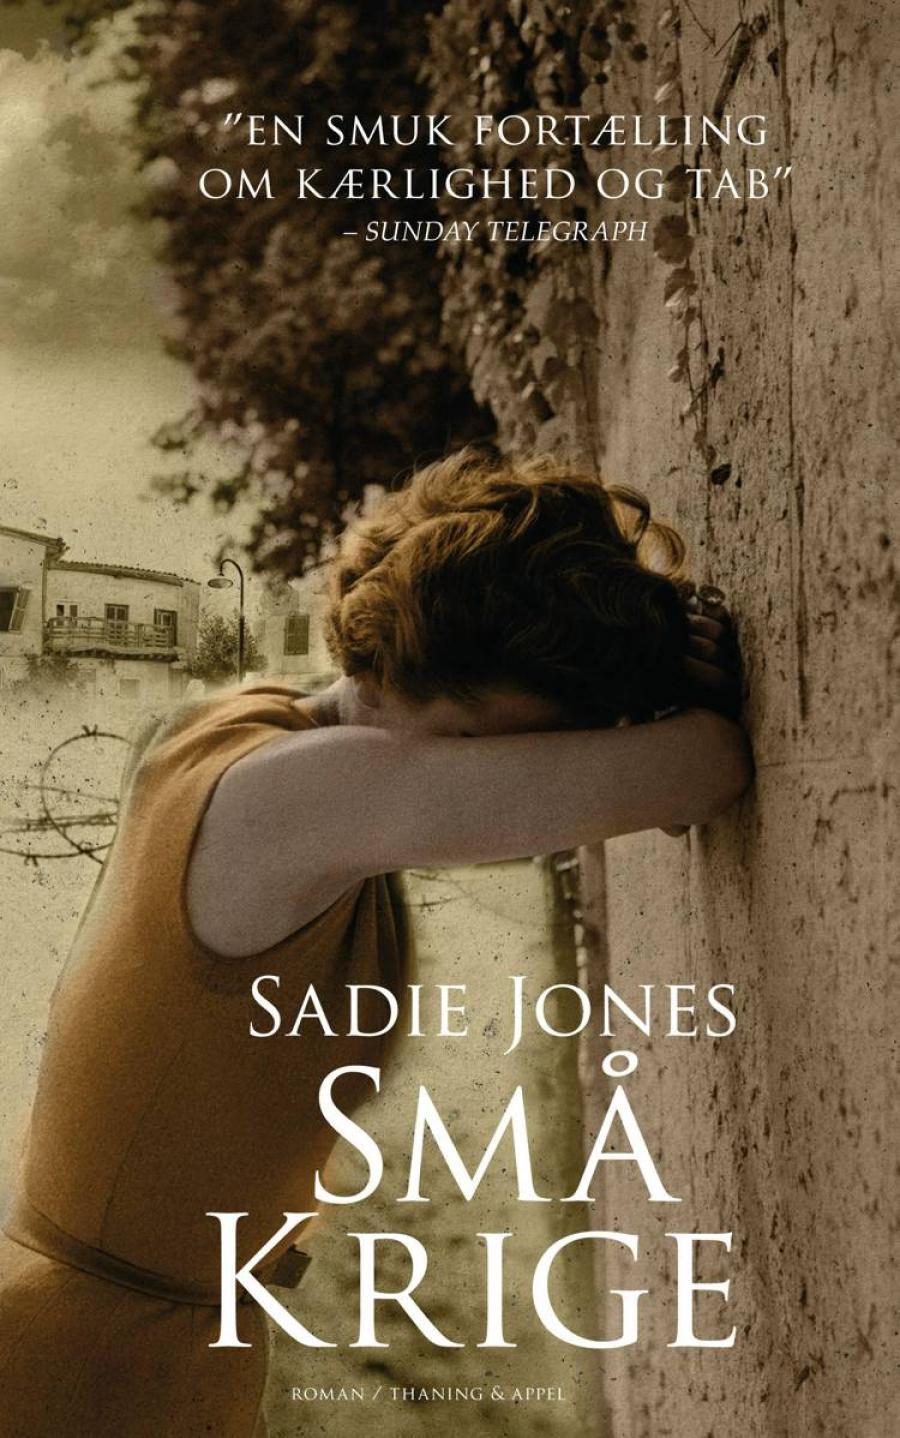 Små krige ad Sadie Jones